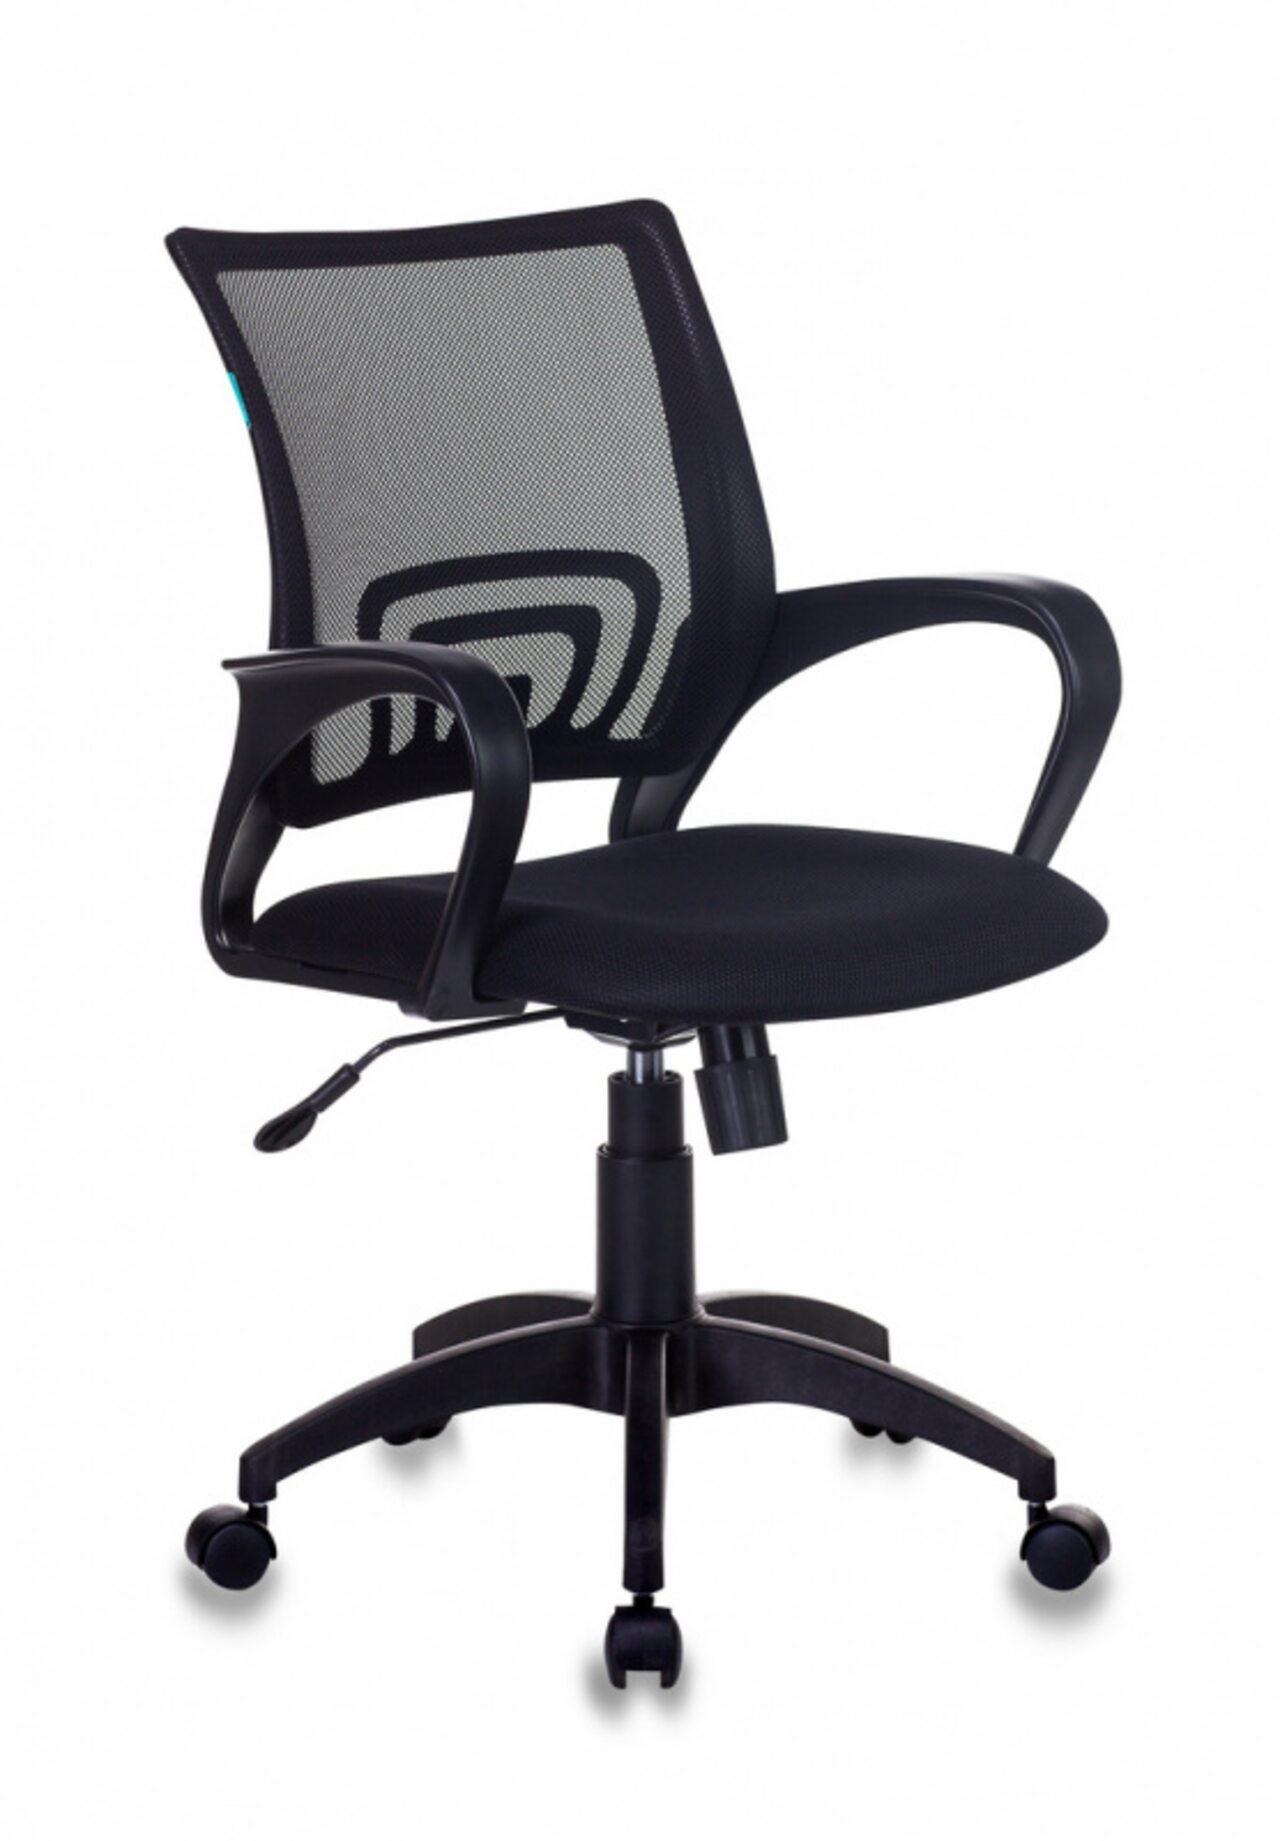 Кресло для персонала CH-695N/ - фото 2